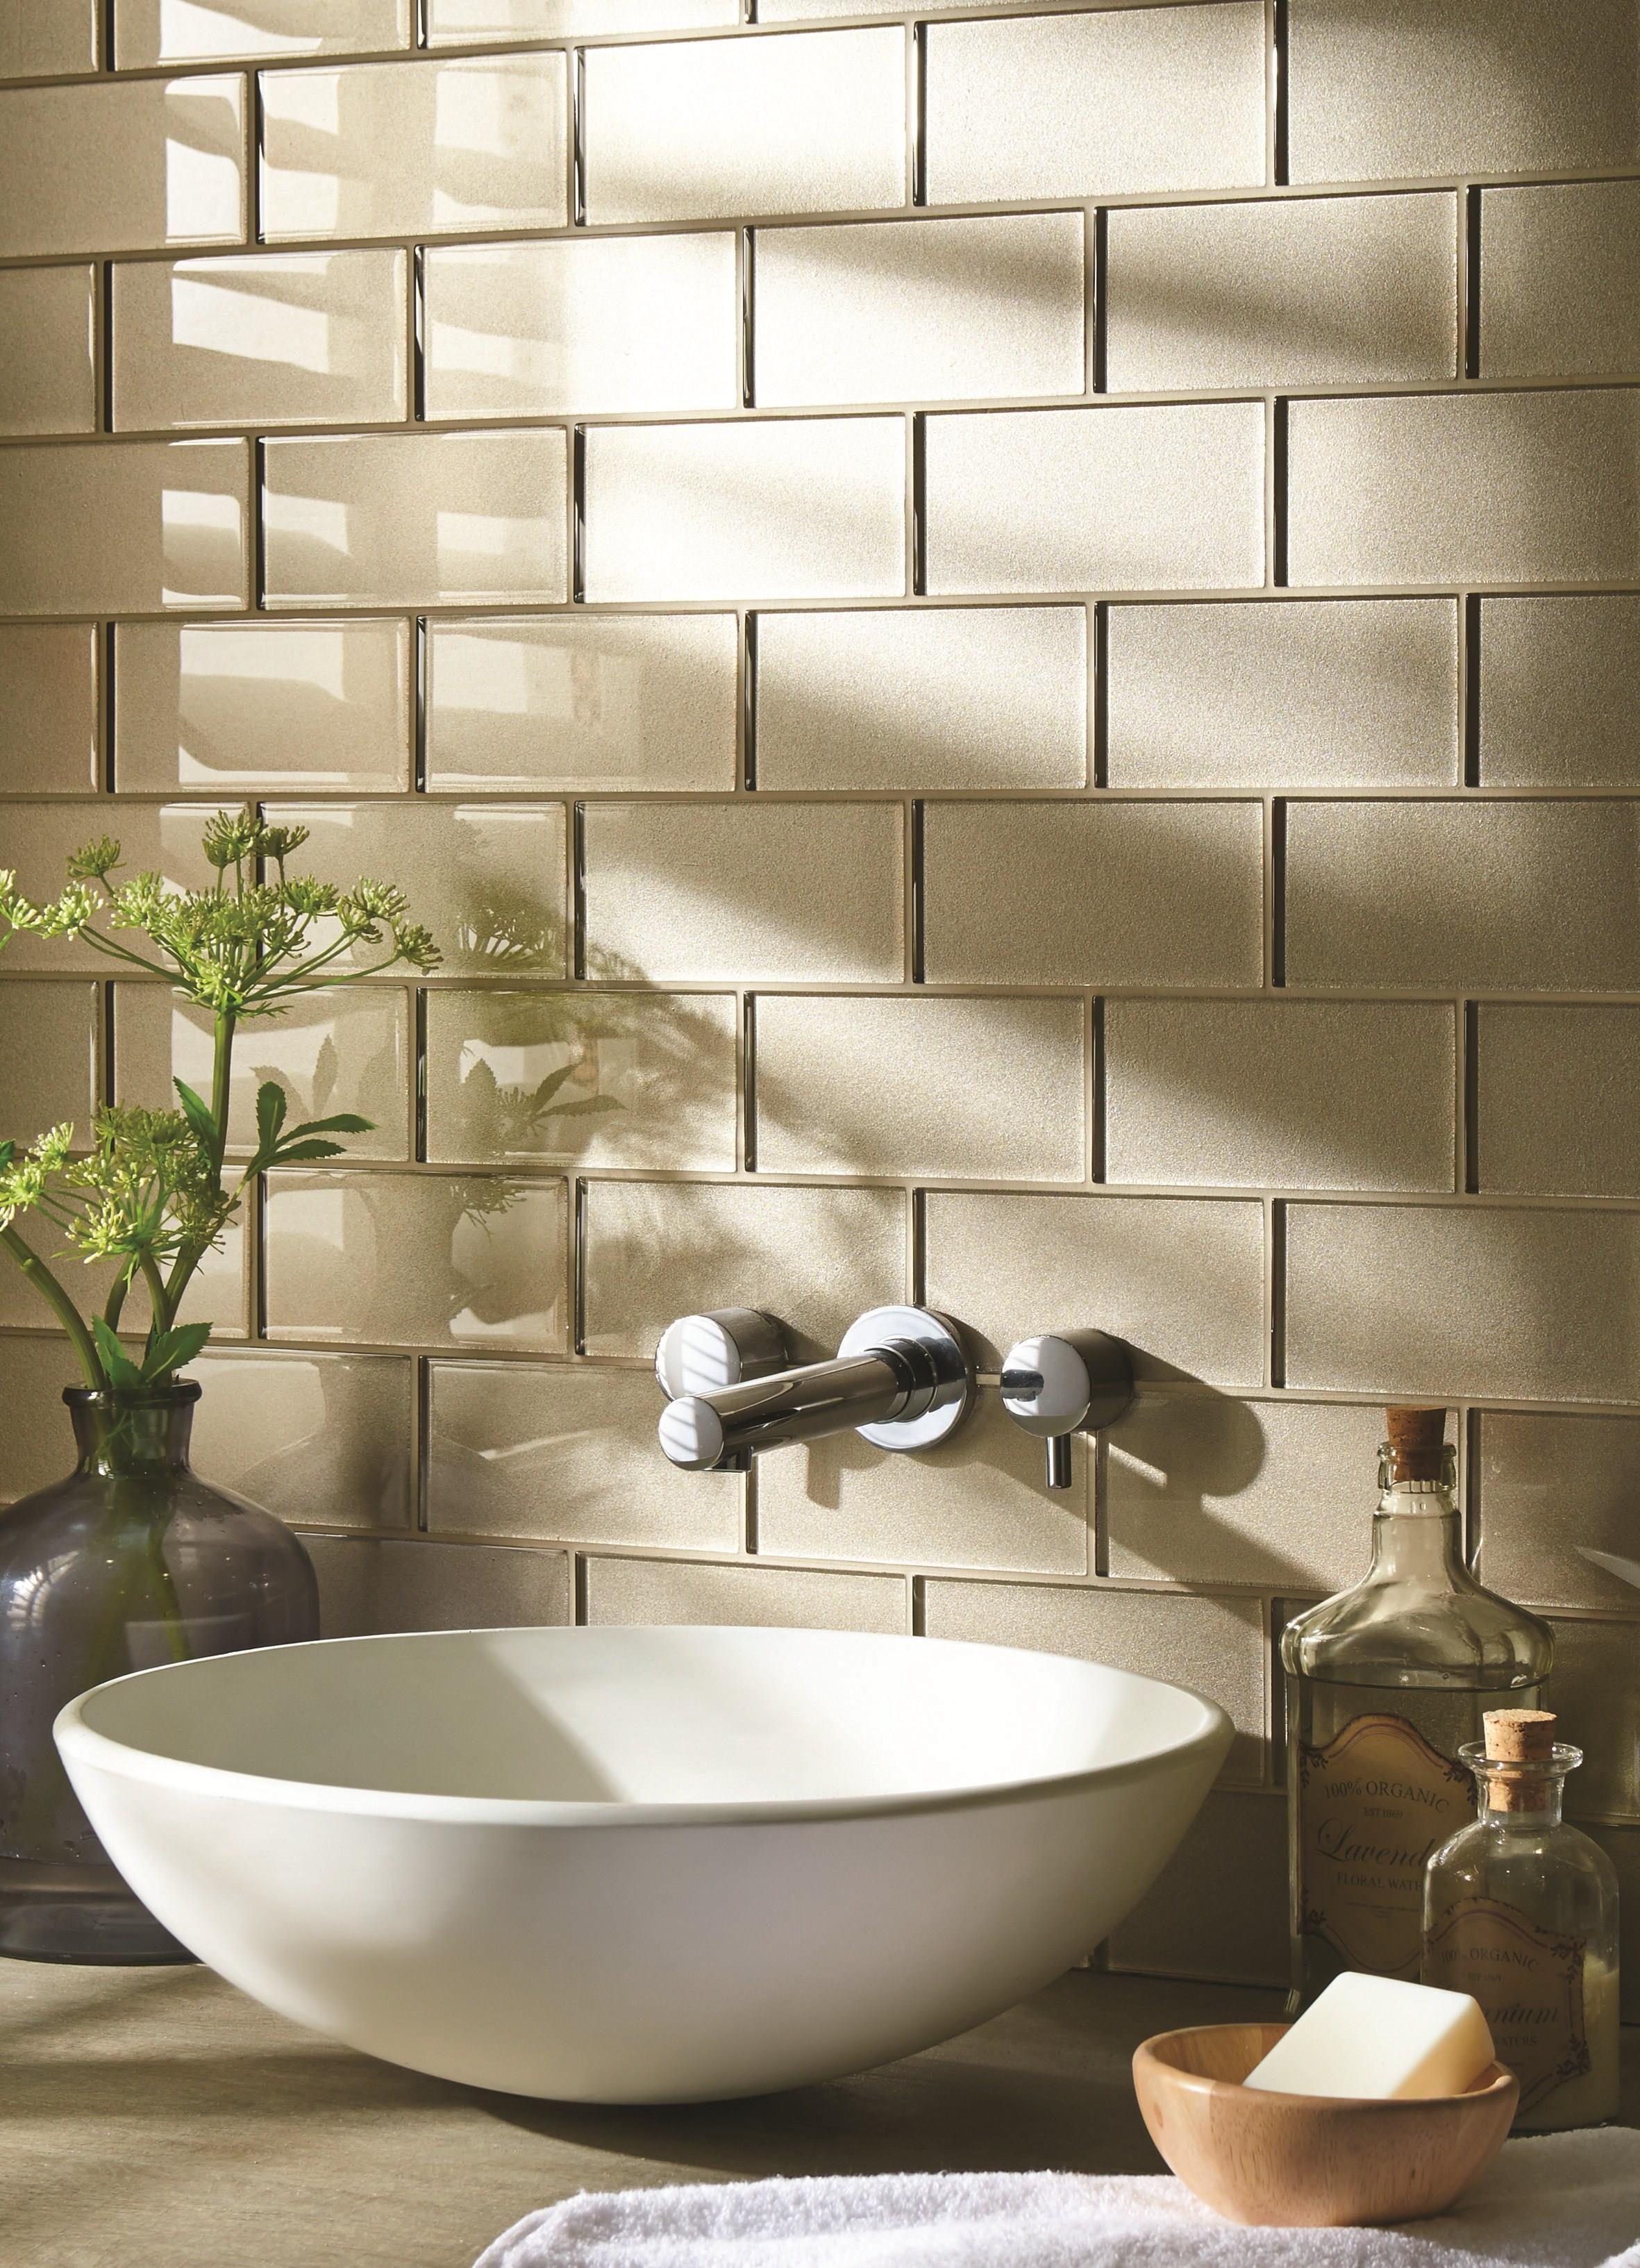 Glass bricks in bathroom - Family Bathroom Starcia Metallic Glass Bricks